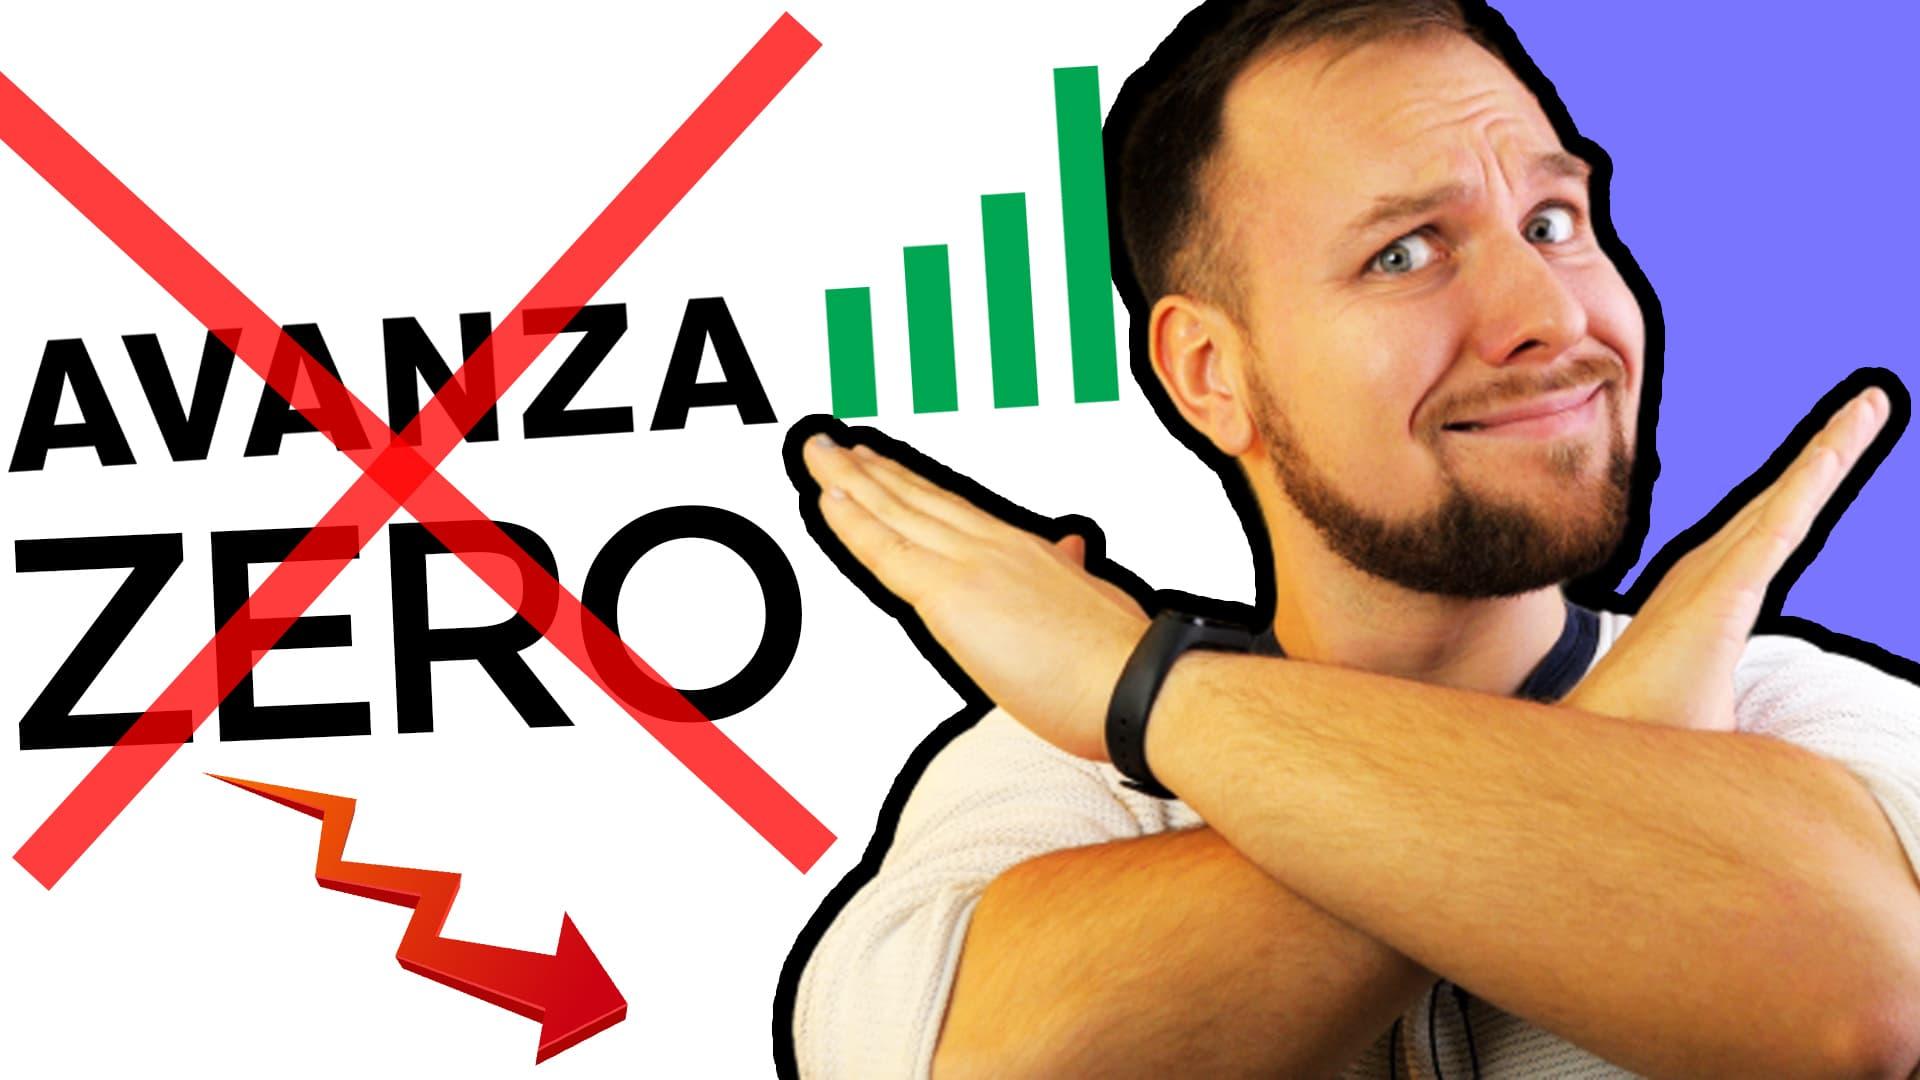 Avanza Zero nej tack